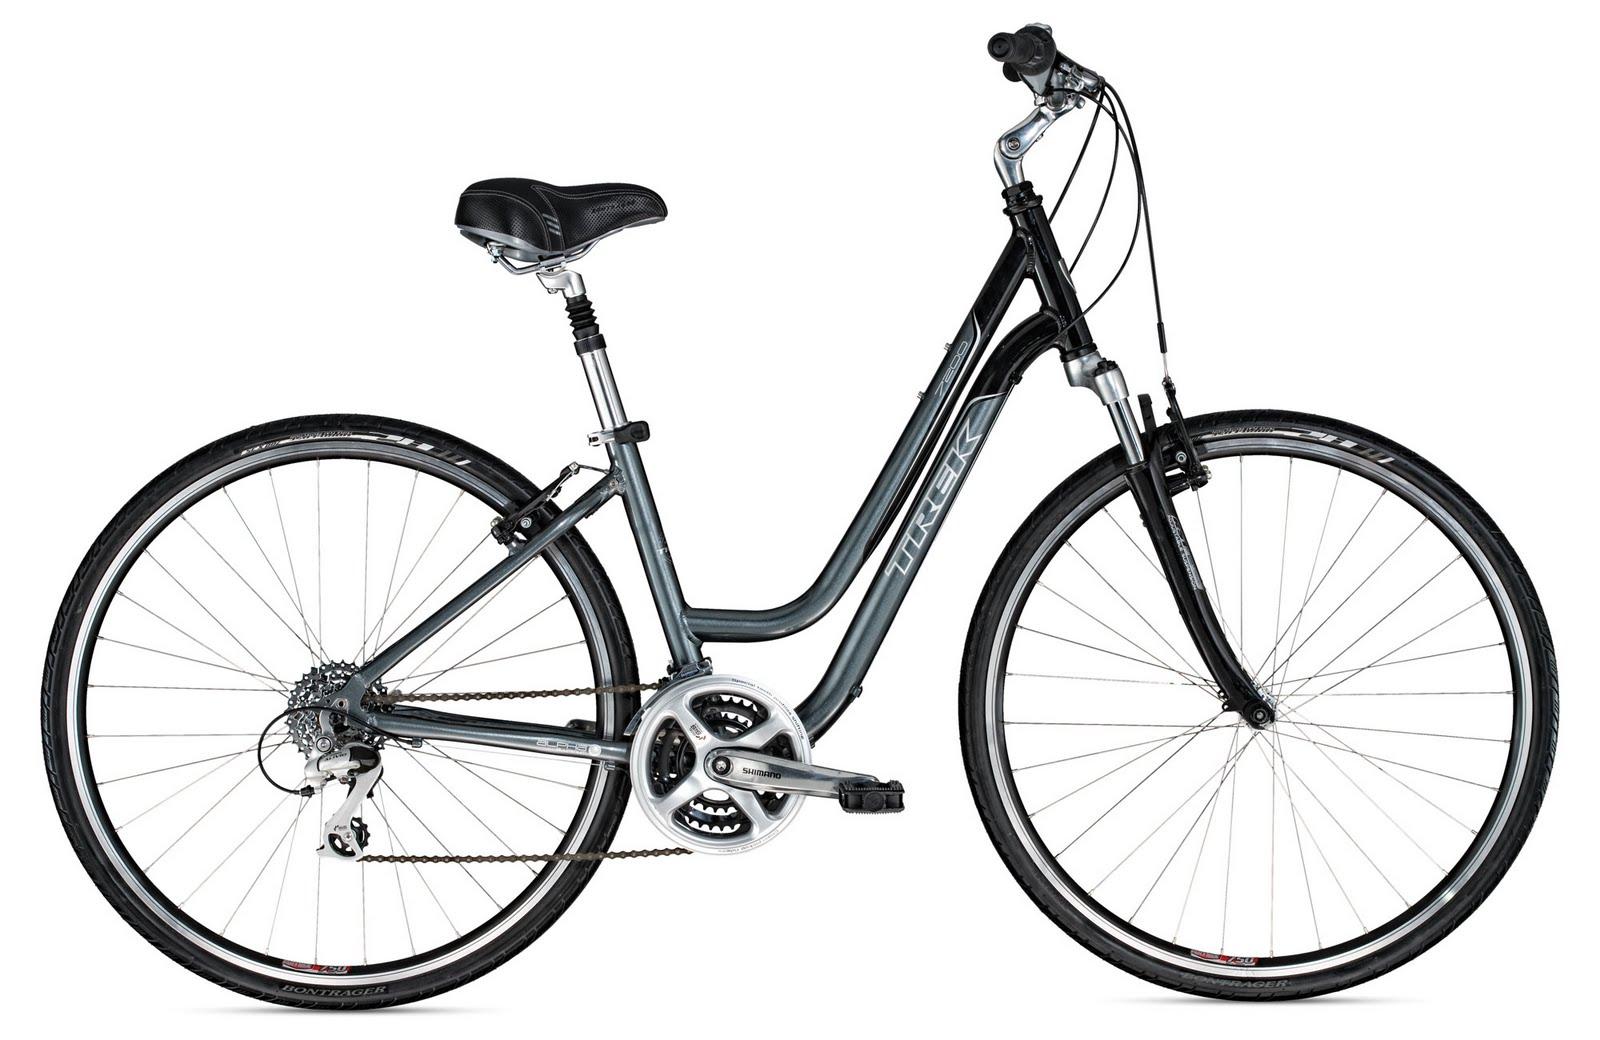 http://3.bp.blogspot.com/_JE-tgaAKGxY/S8PkVQuMQMI/AAAAAAAAC-I/-c91yzPG5e8/s1600/bike.jpg